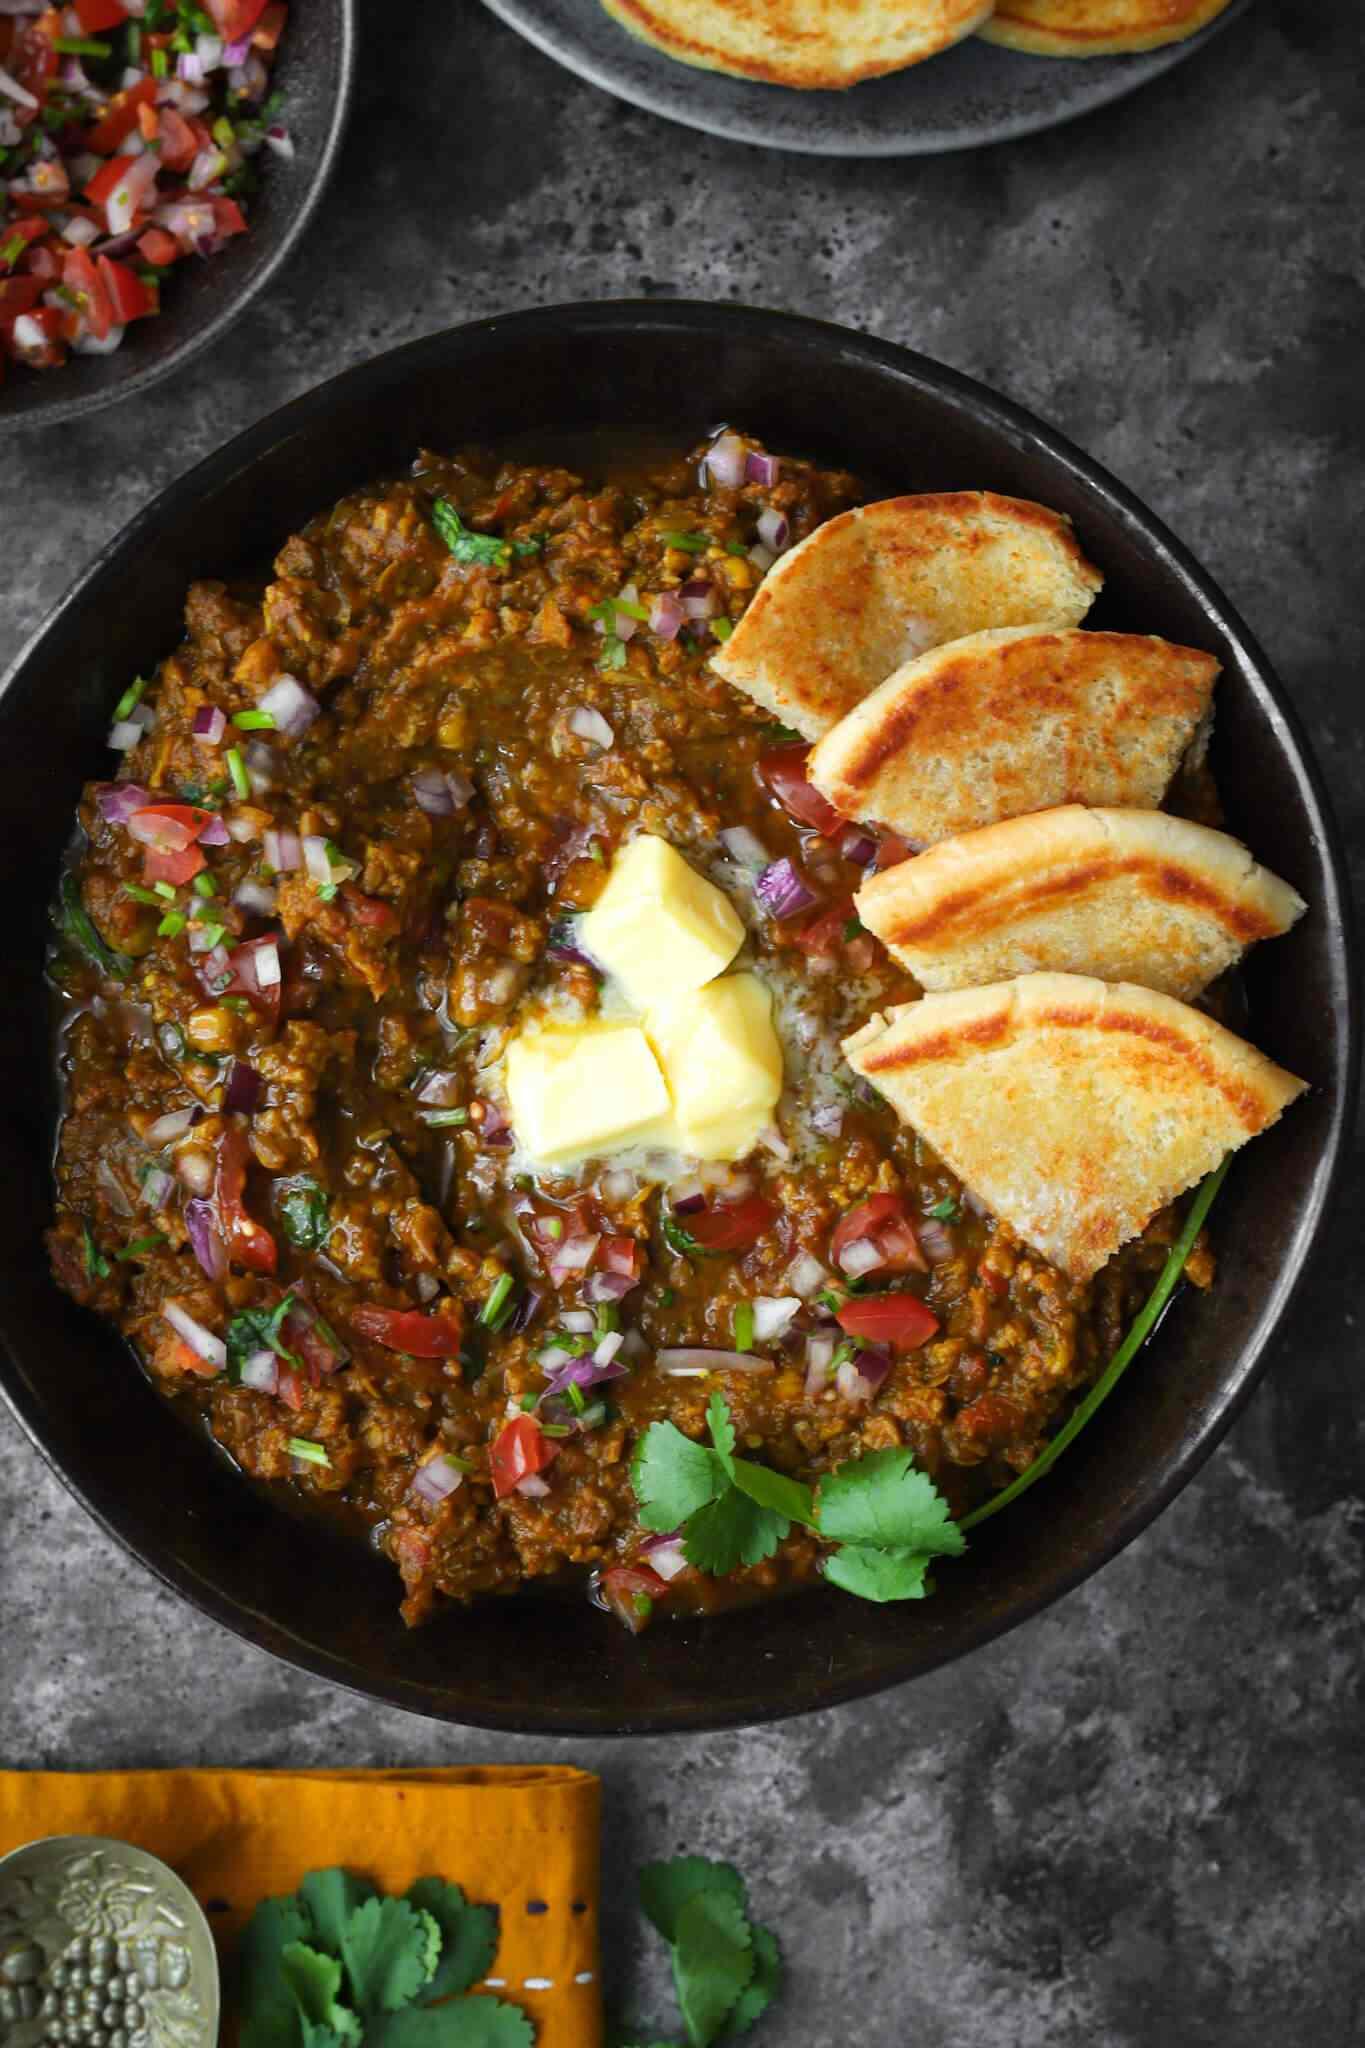 Bodhi's Keema Pau Bhaji (Vegan) recipe